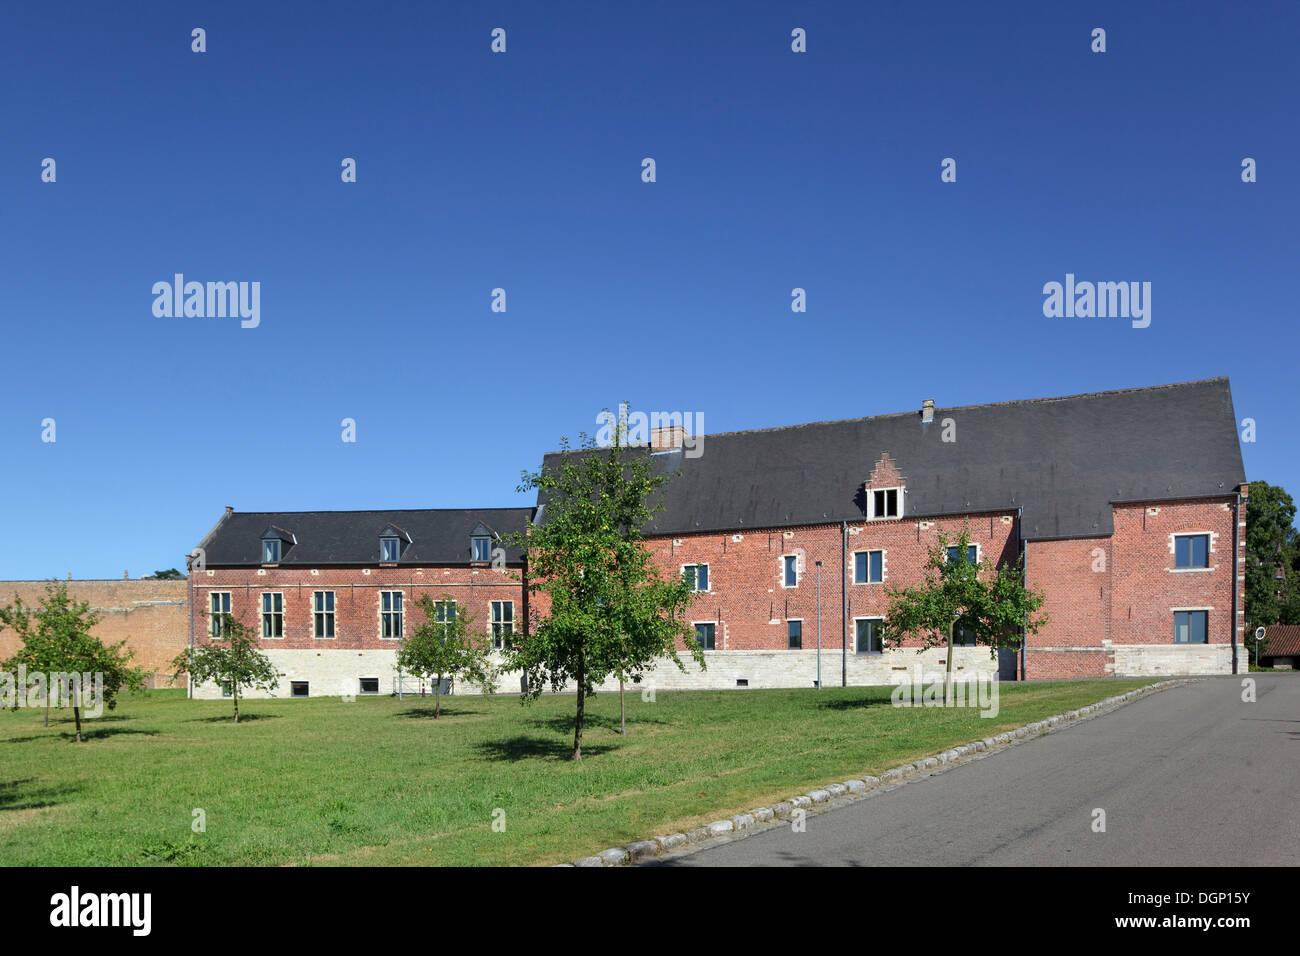 Catholic University of Leuven Arenberg Library, Leuven, Belgium. Architect: Rafael Moneo, 2002. Convent building seen from orcha - Stock Image